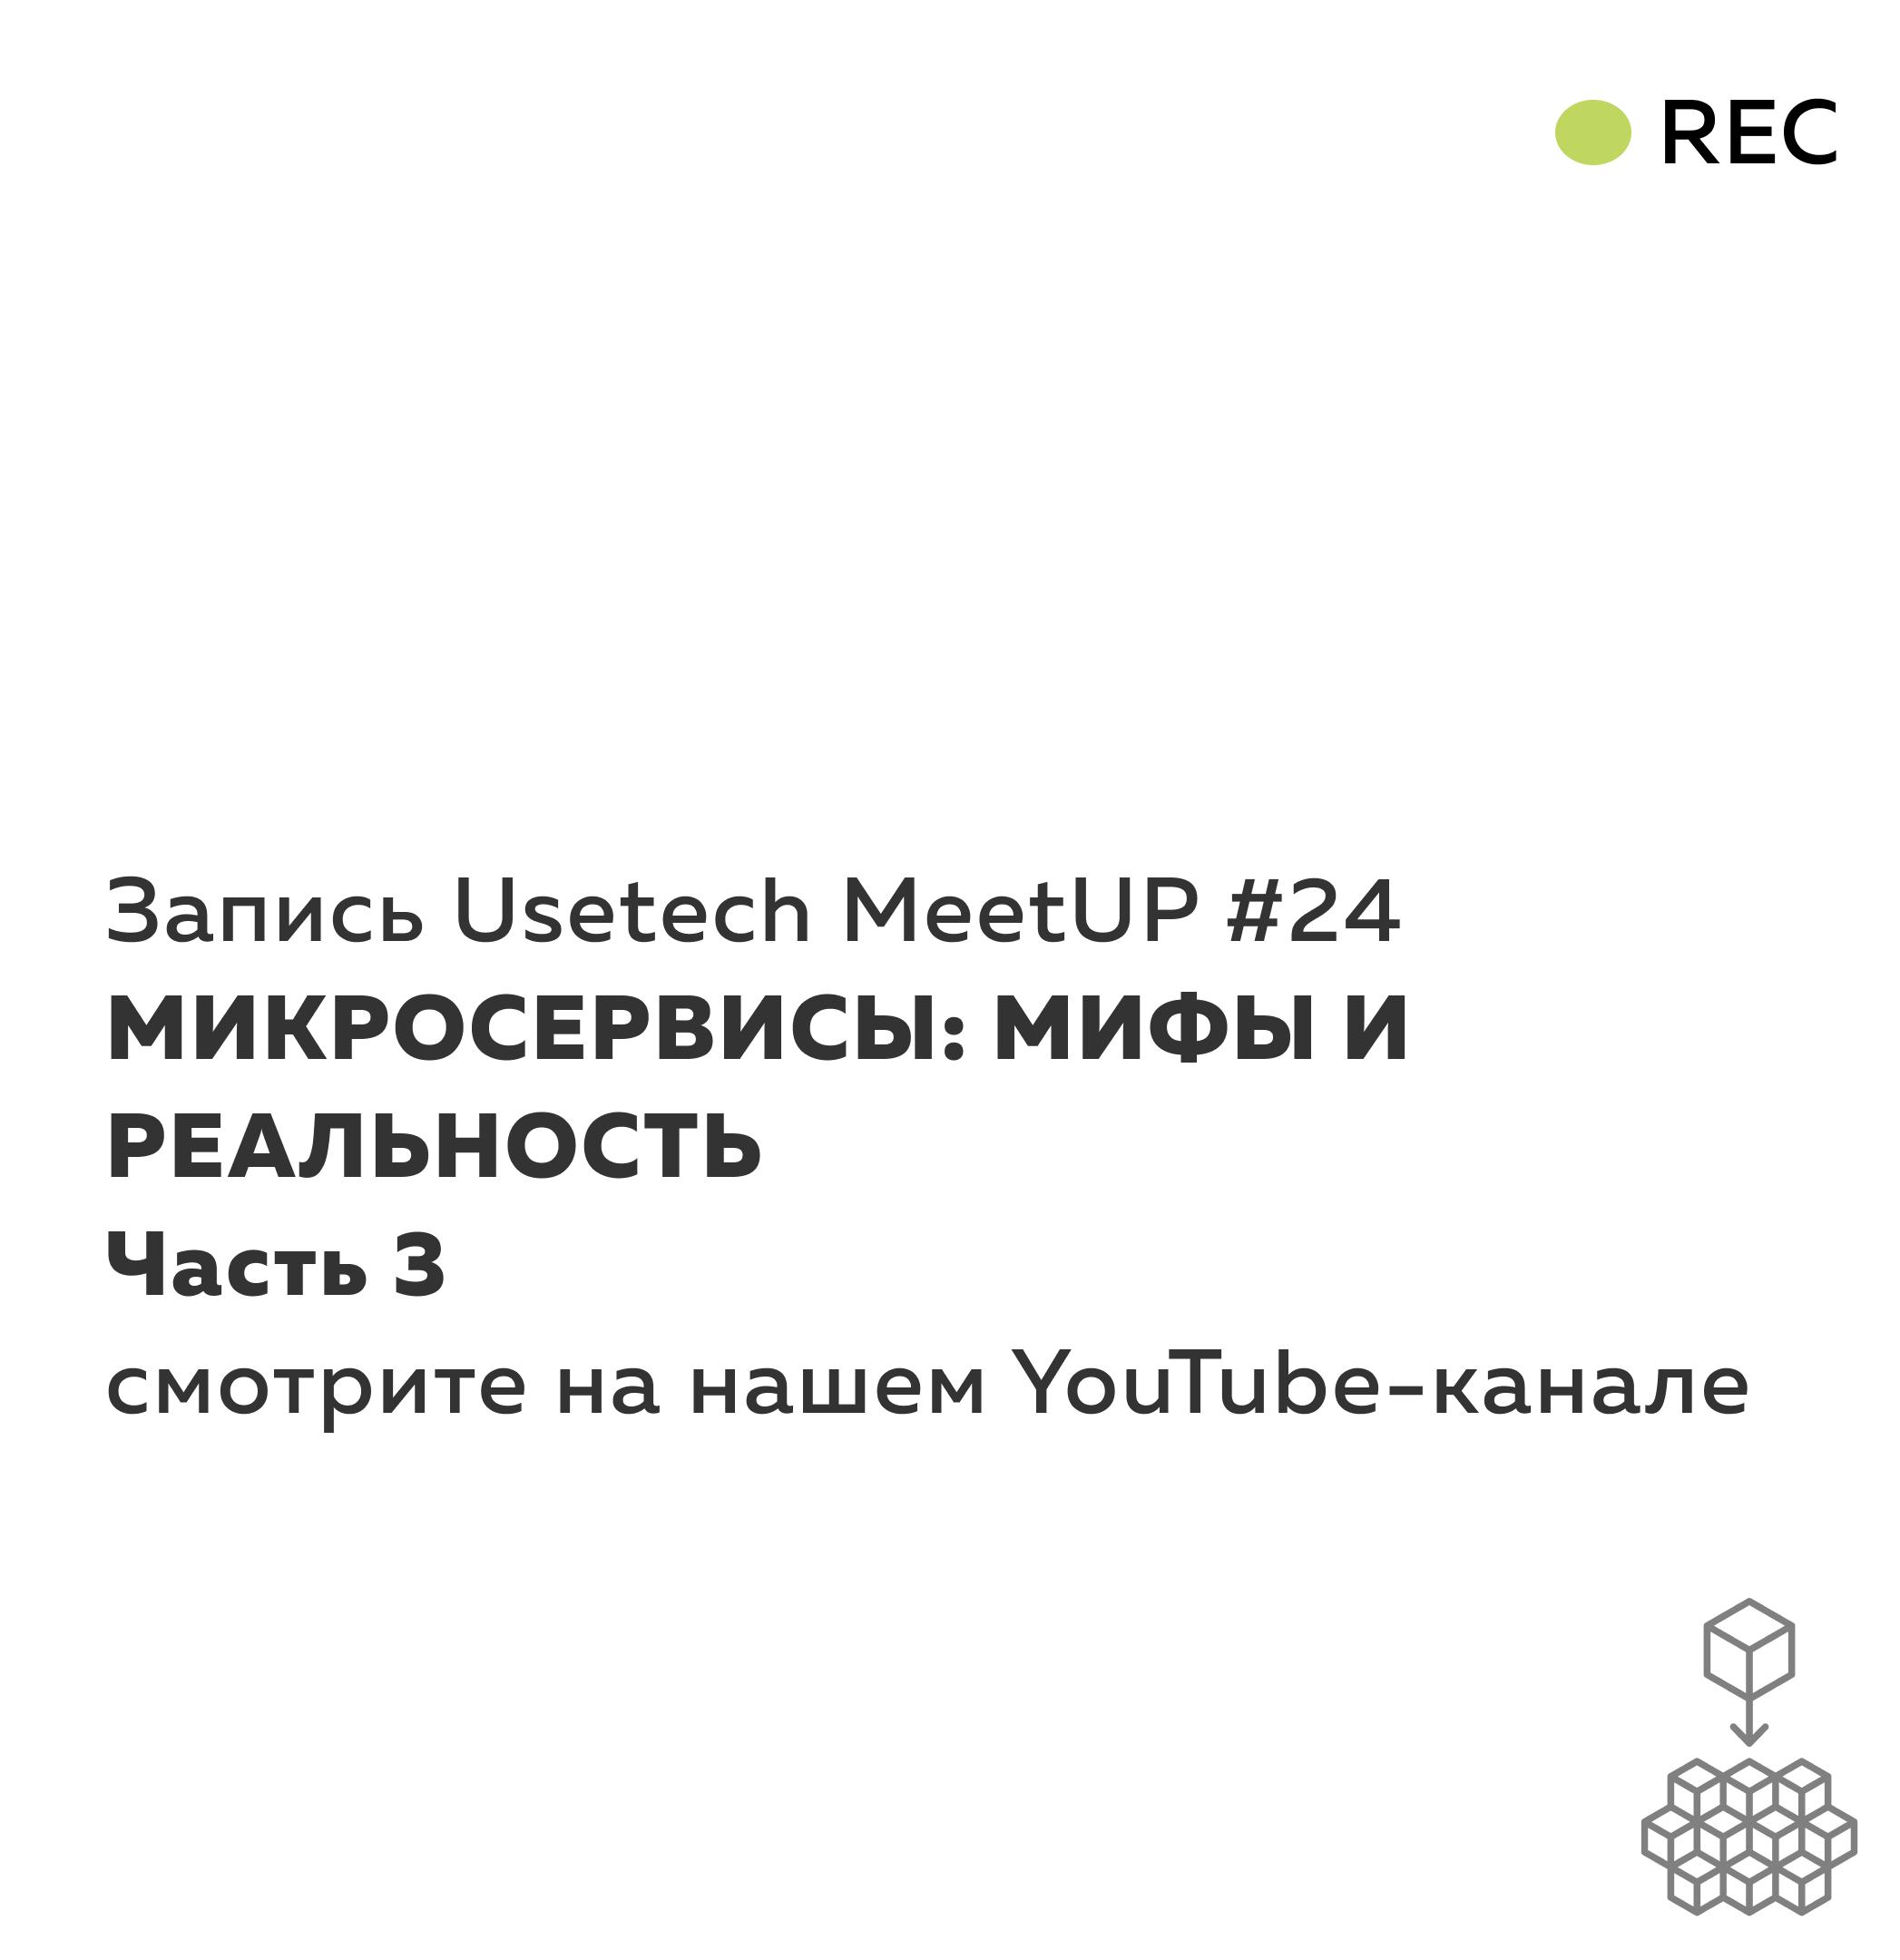 Usetech MeetUP #24 — запись вебинара